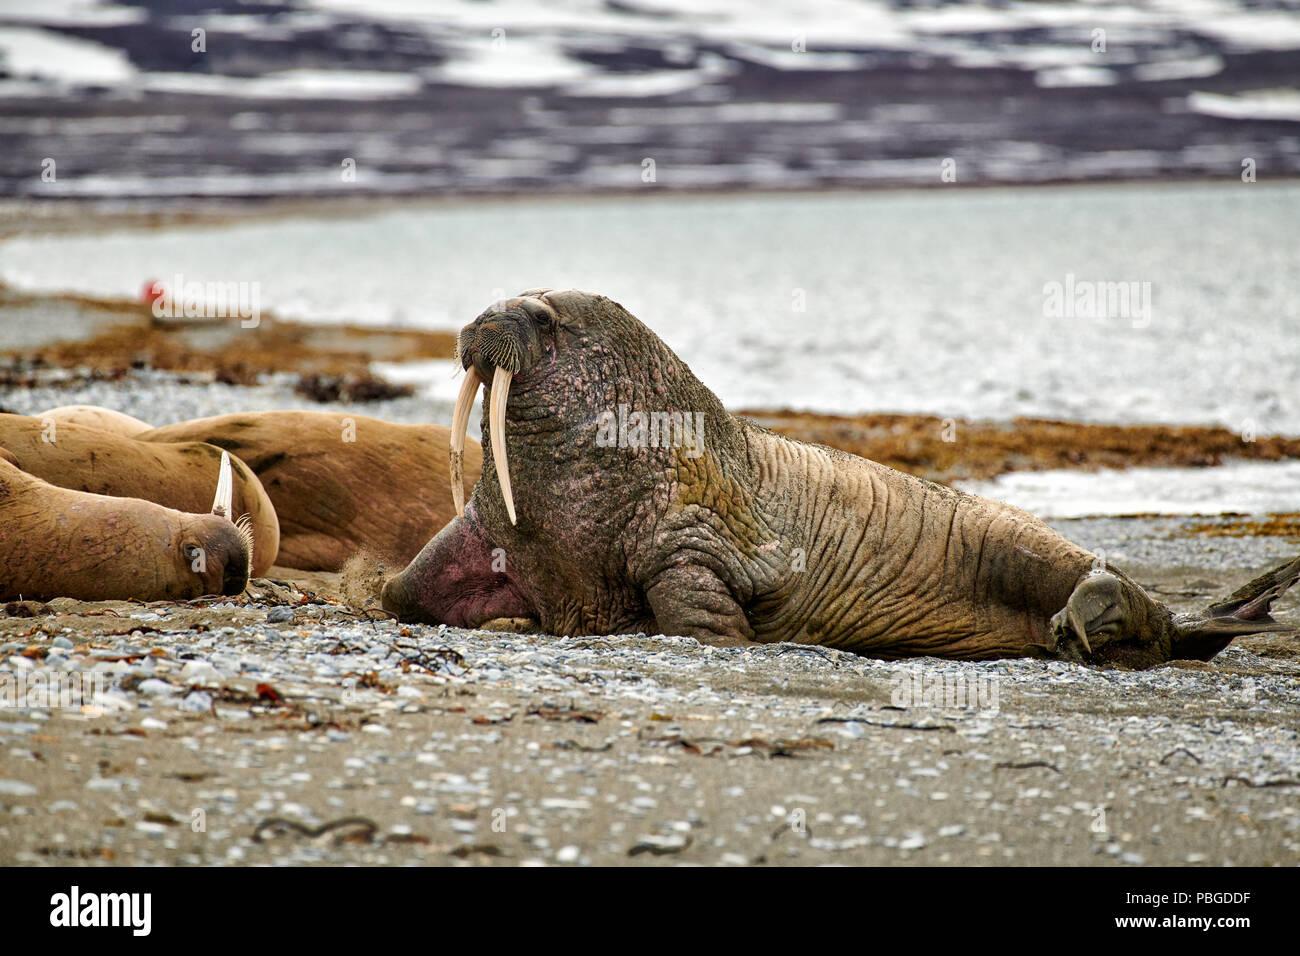 La morsa, Odobenus rosmarus, Poolepynten, Svalbard o Spitsbergen, Europa Imagen De Stock